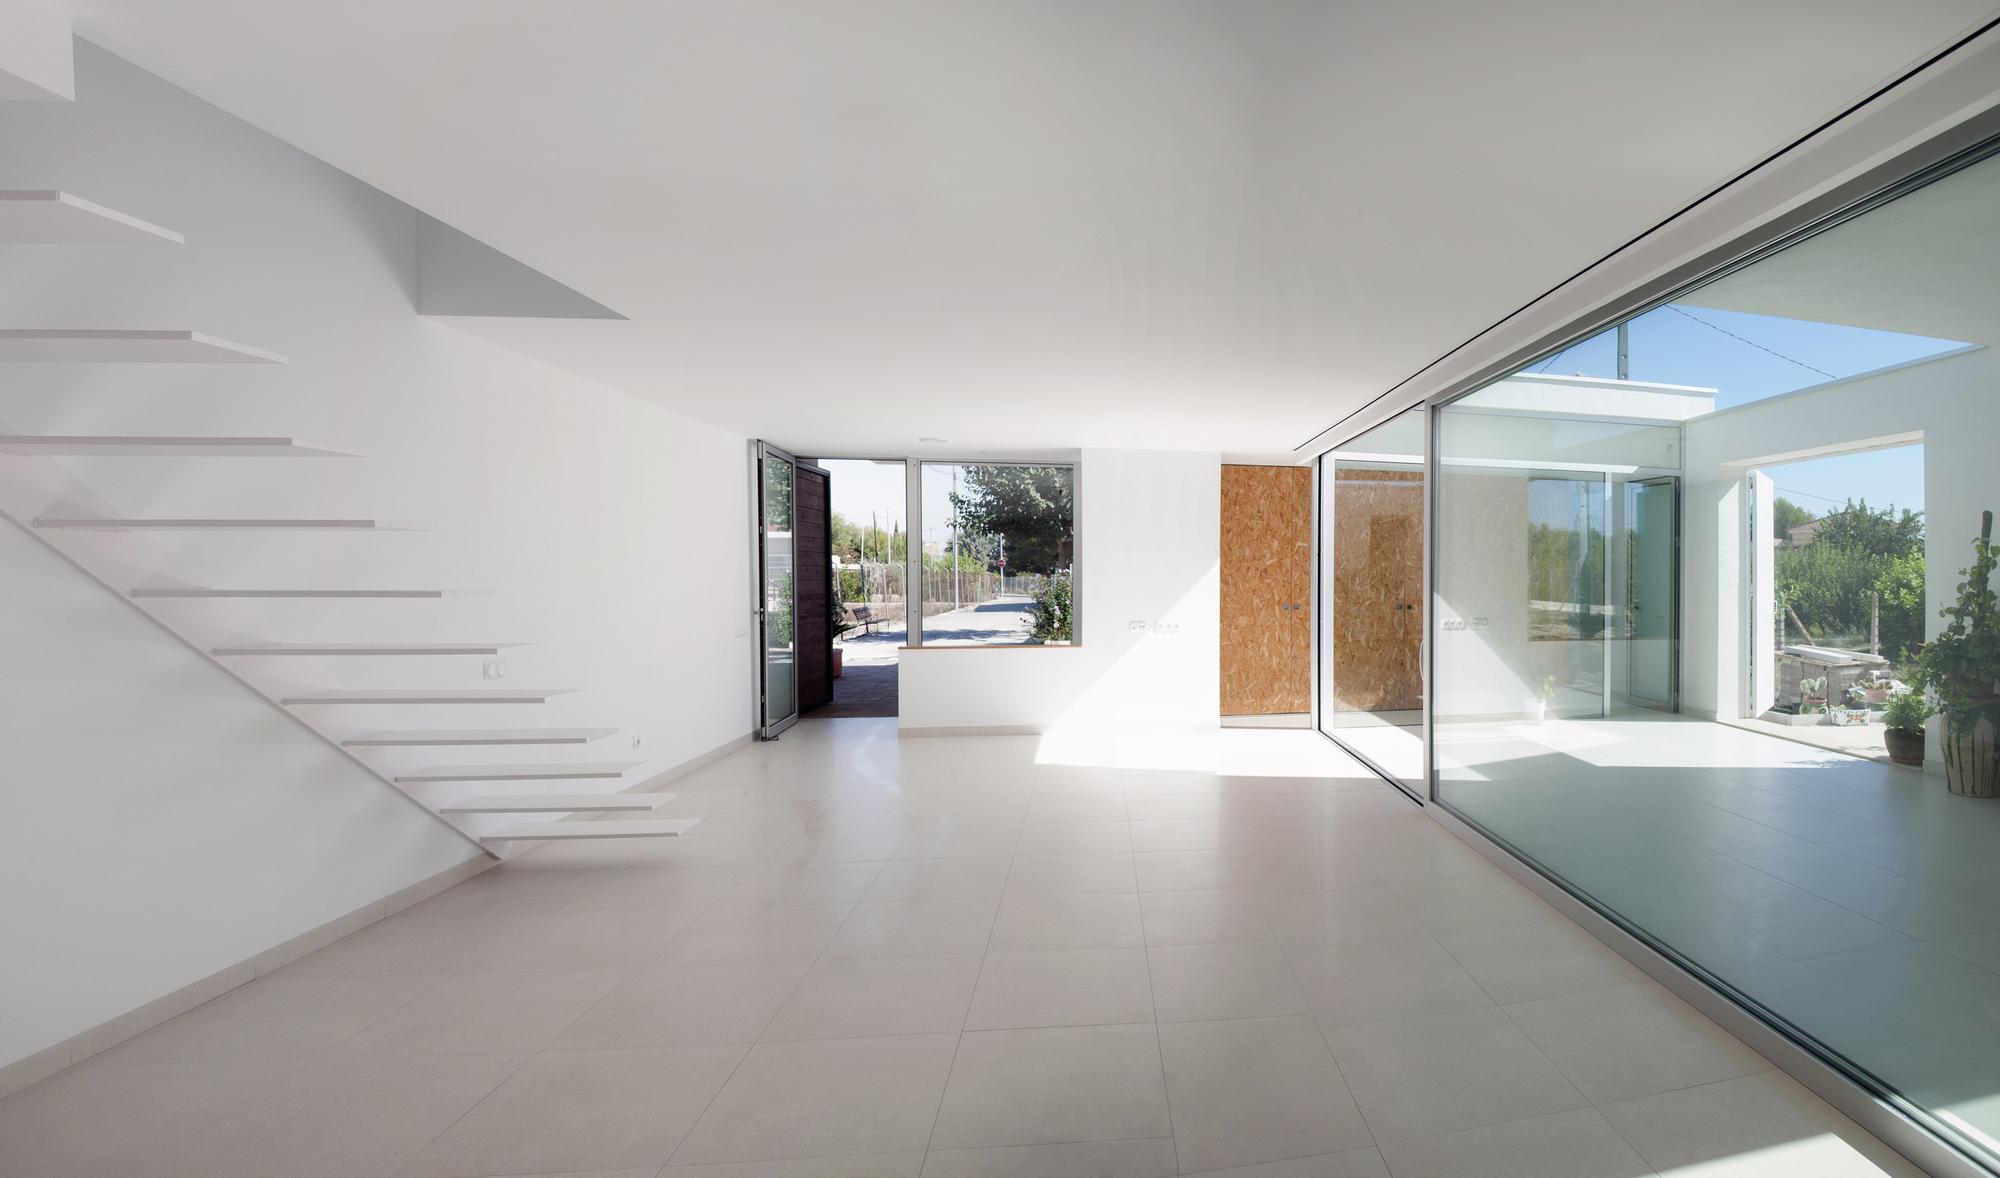 Casa Pequeña para una Familia Numerosa / La Mirateca | ArchDaily ...